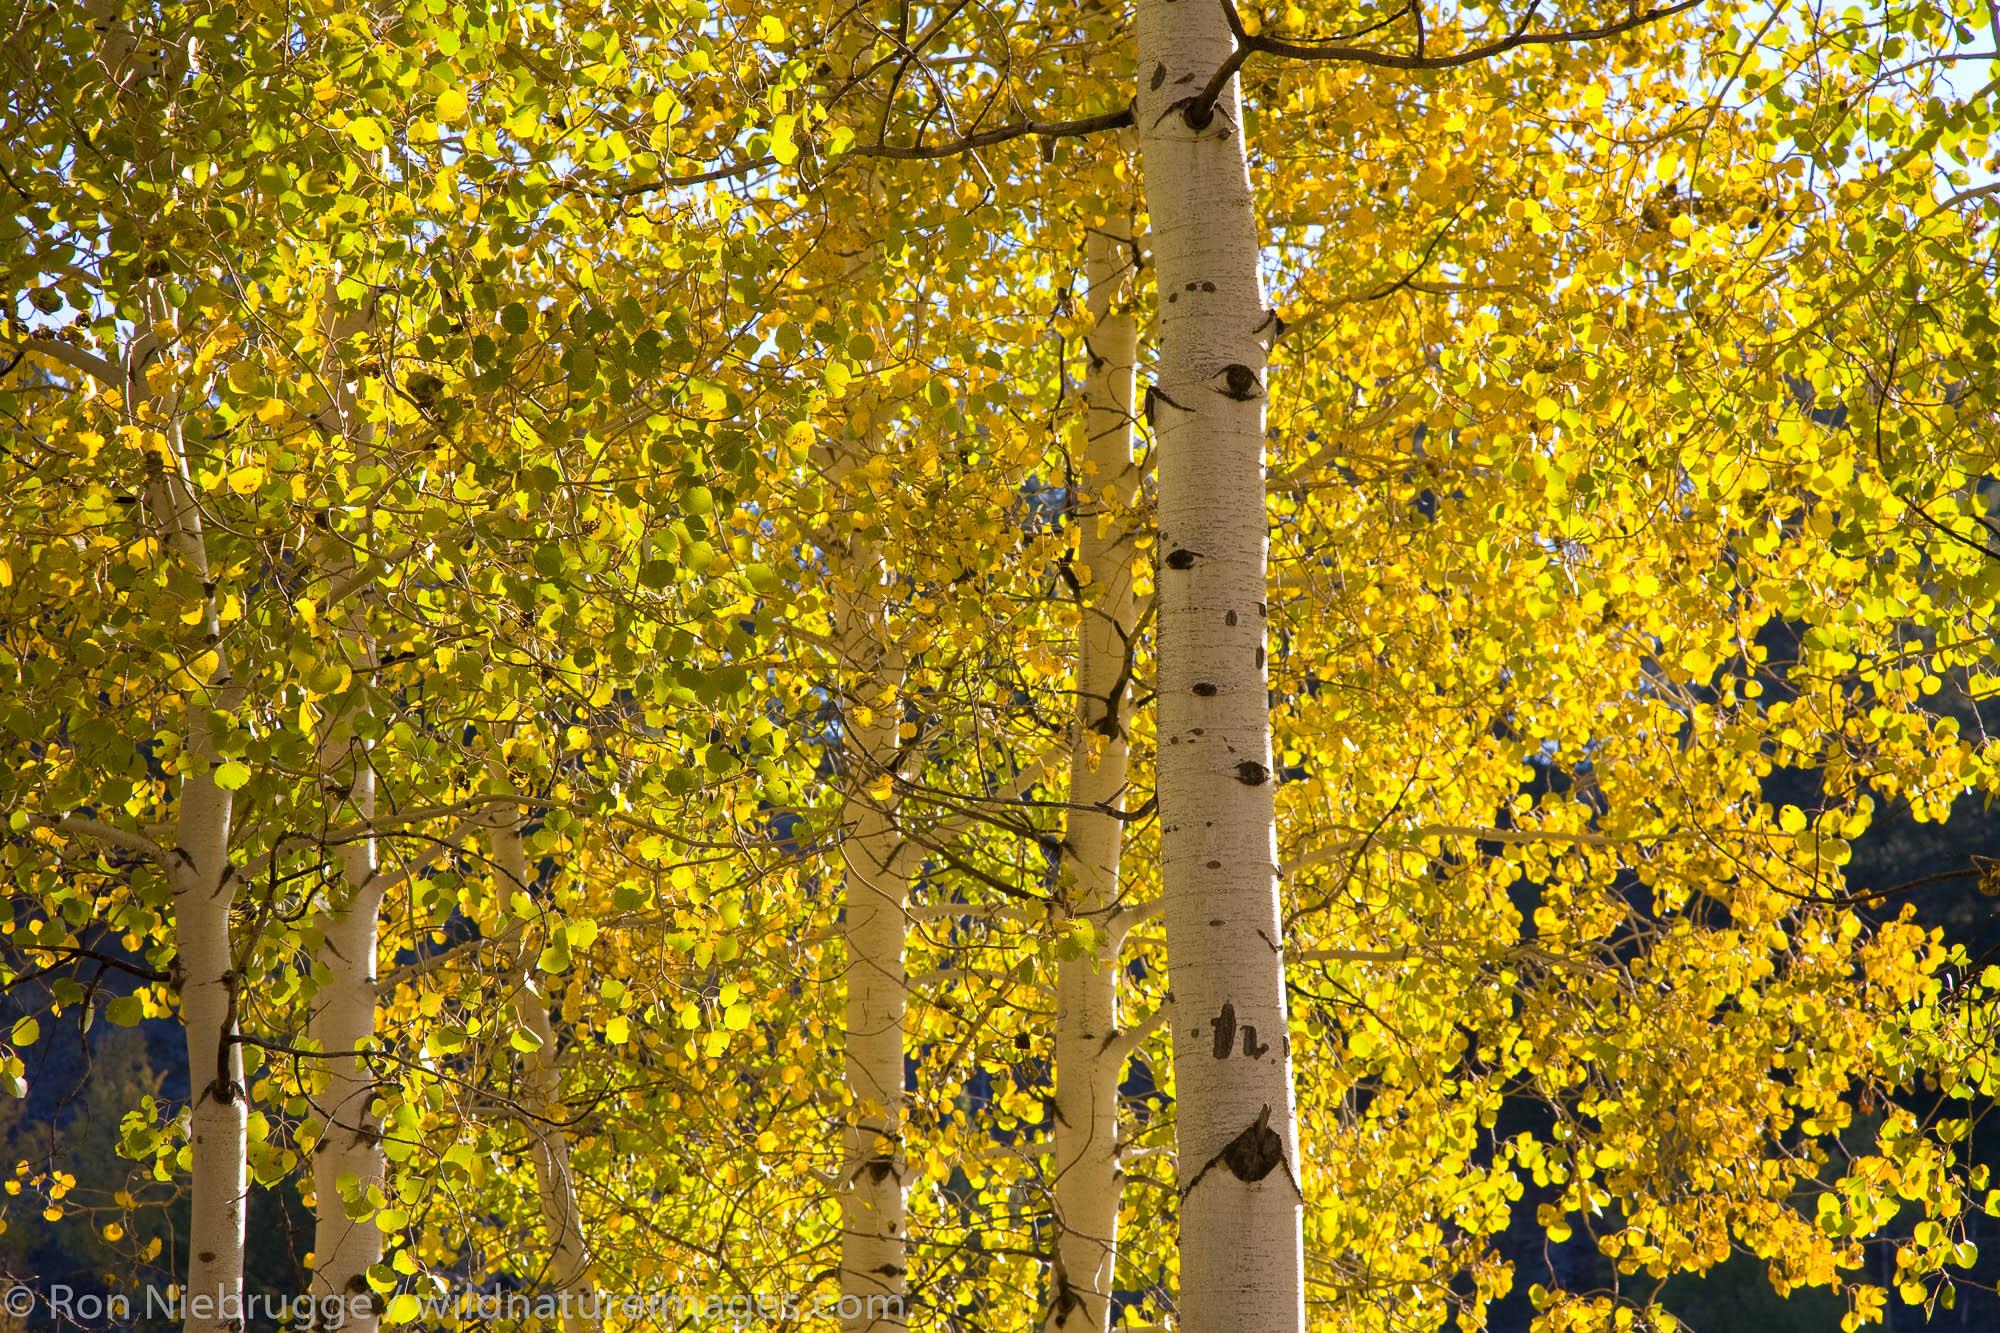 Fall trees near Oxbow Bend, Grand Teton National Park, Wyoming.